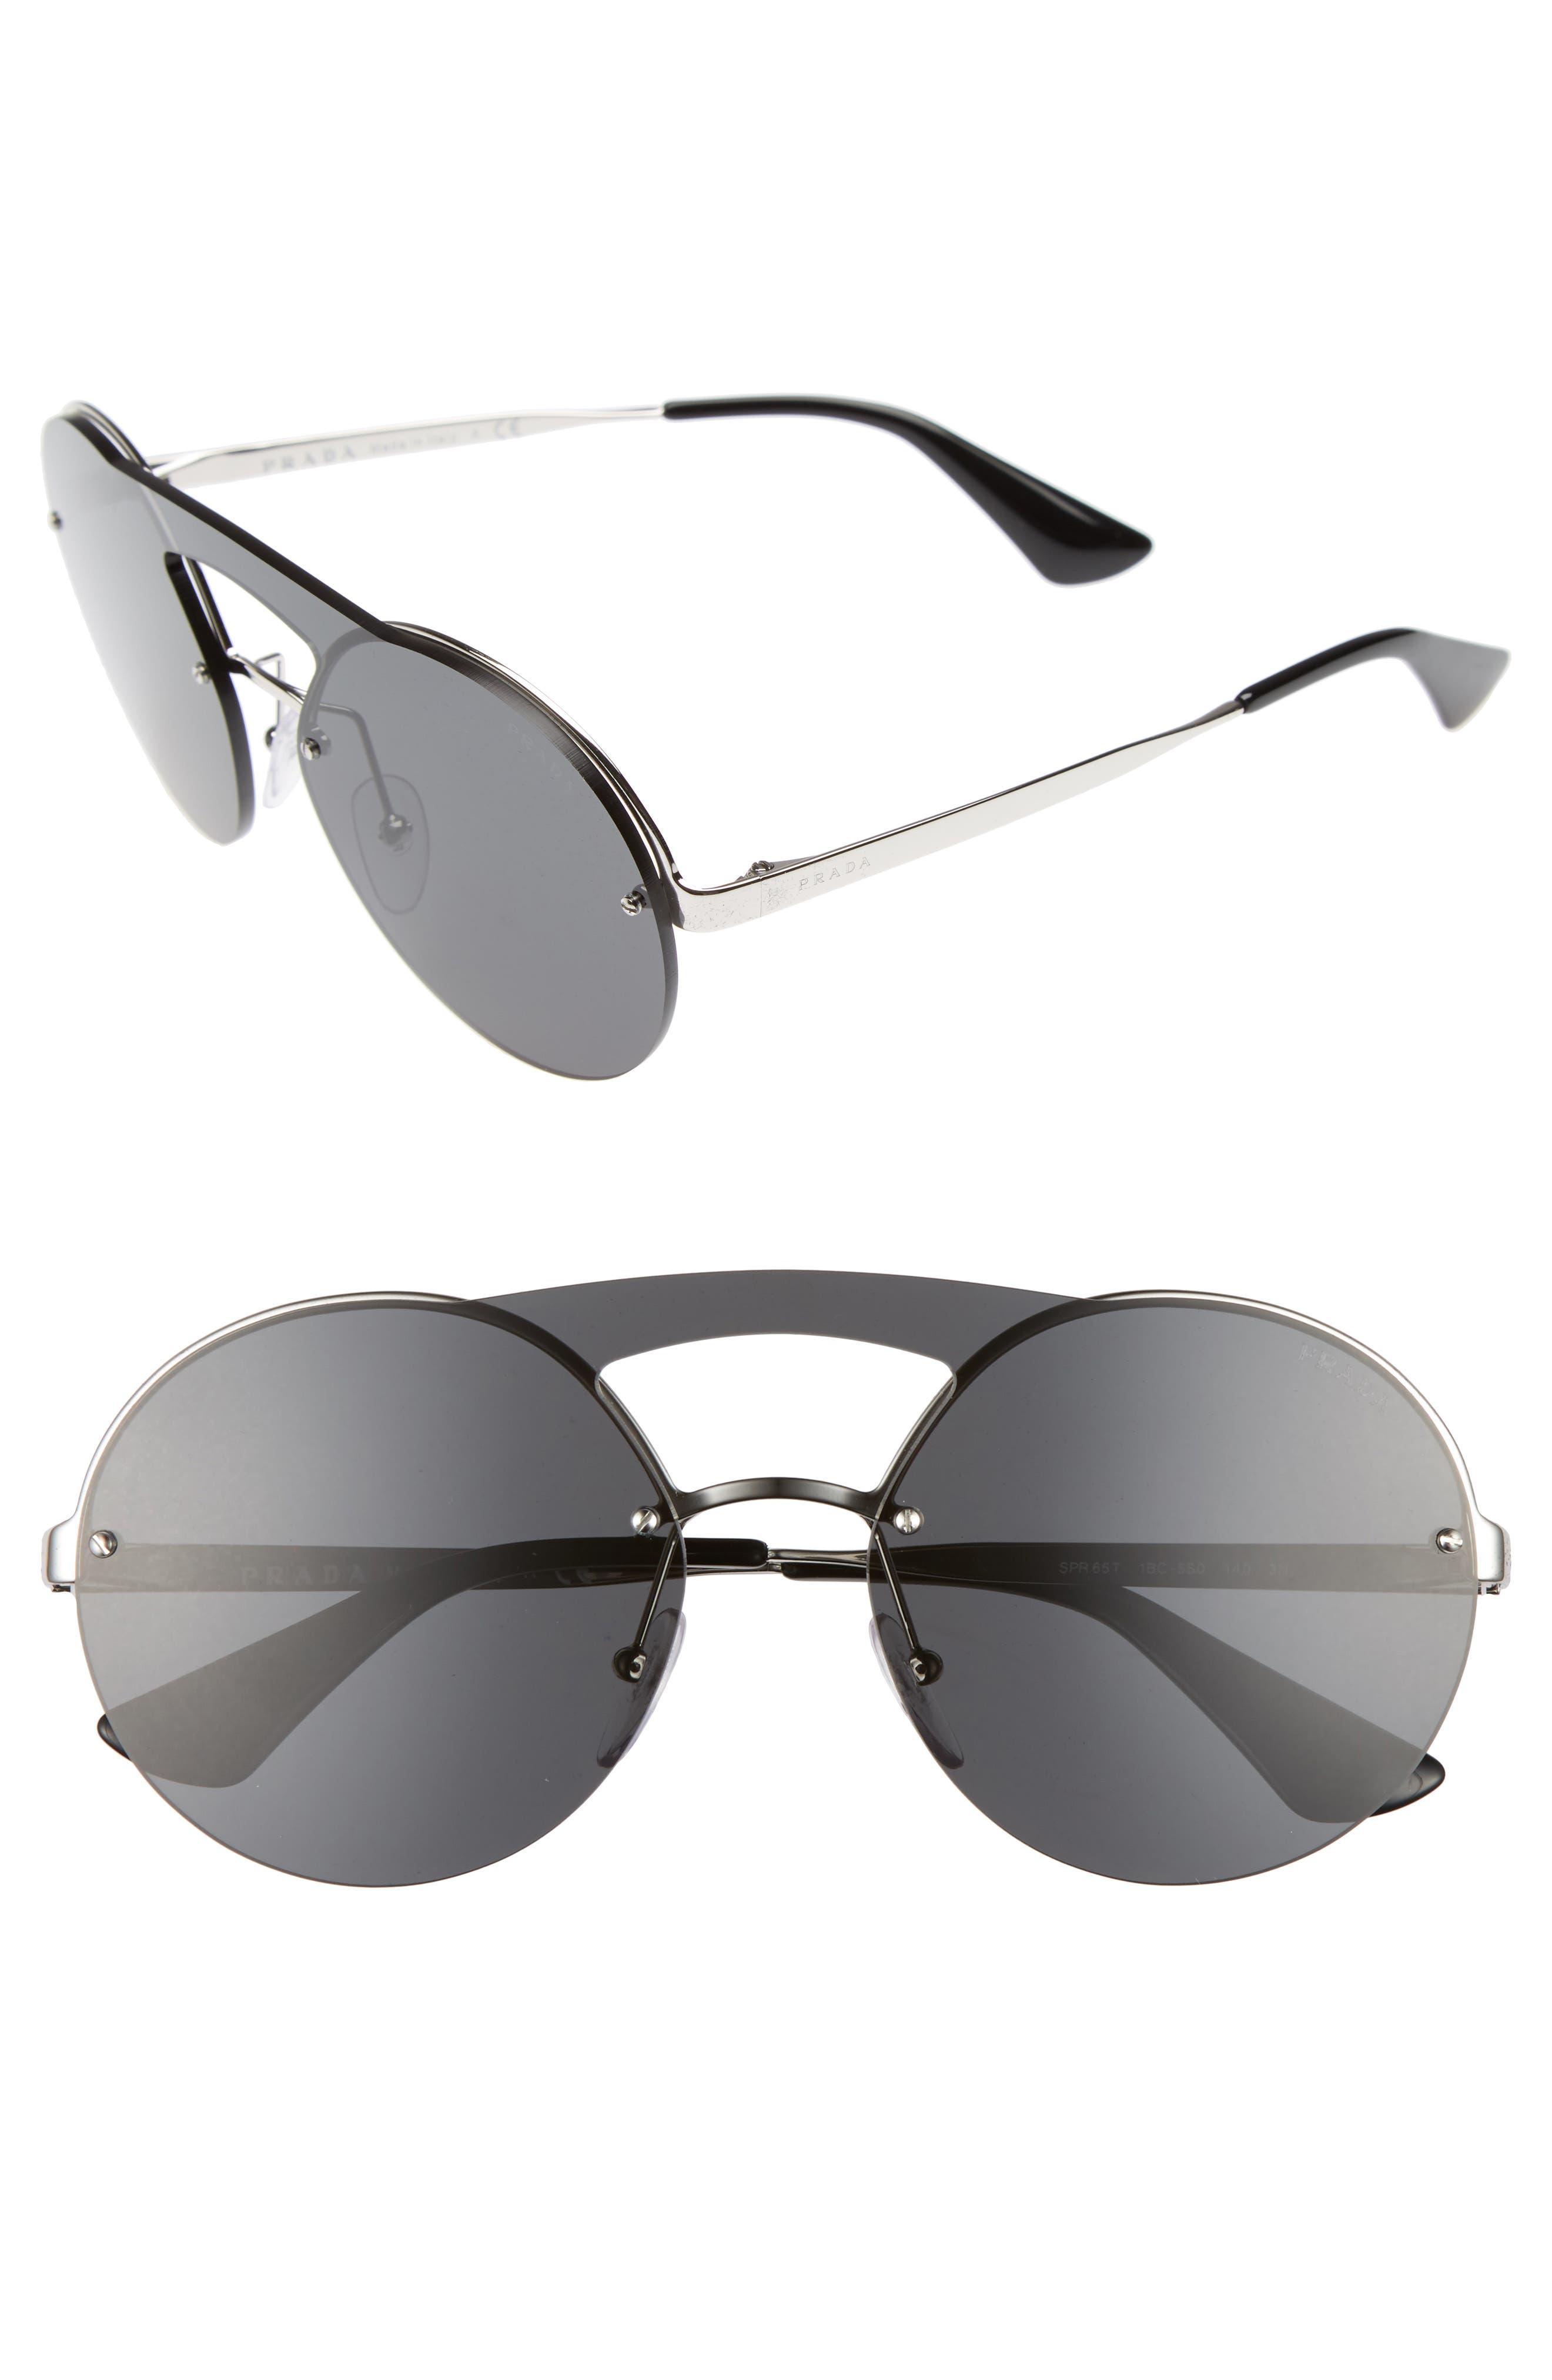 60mm Round Rimless Sunglasses,                         Main,                         color, 020